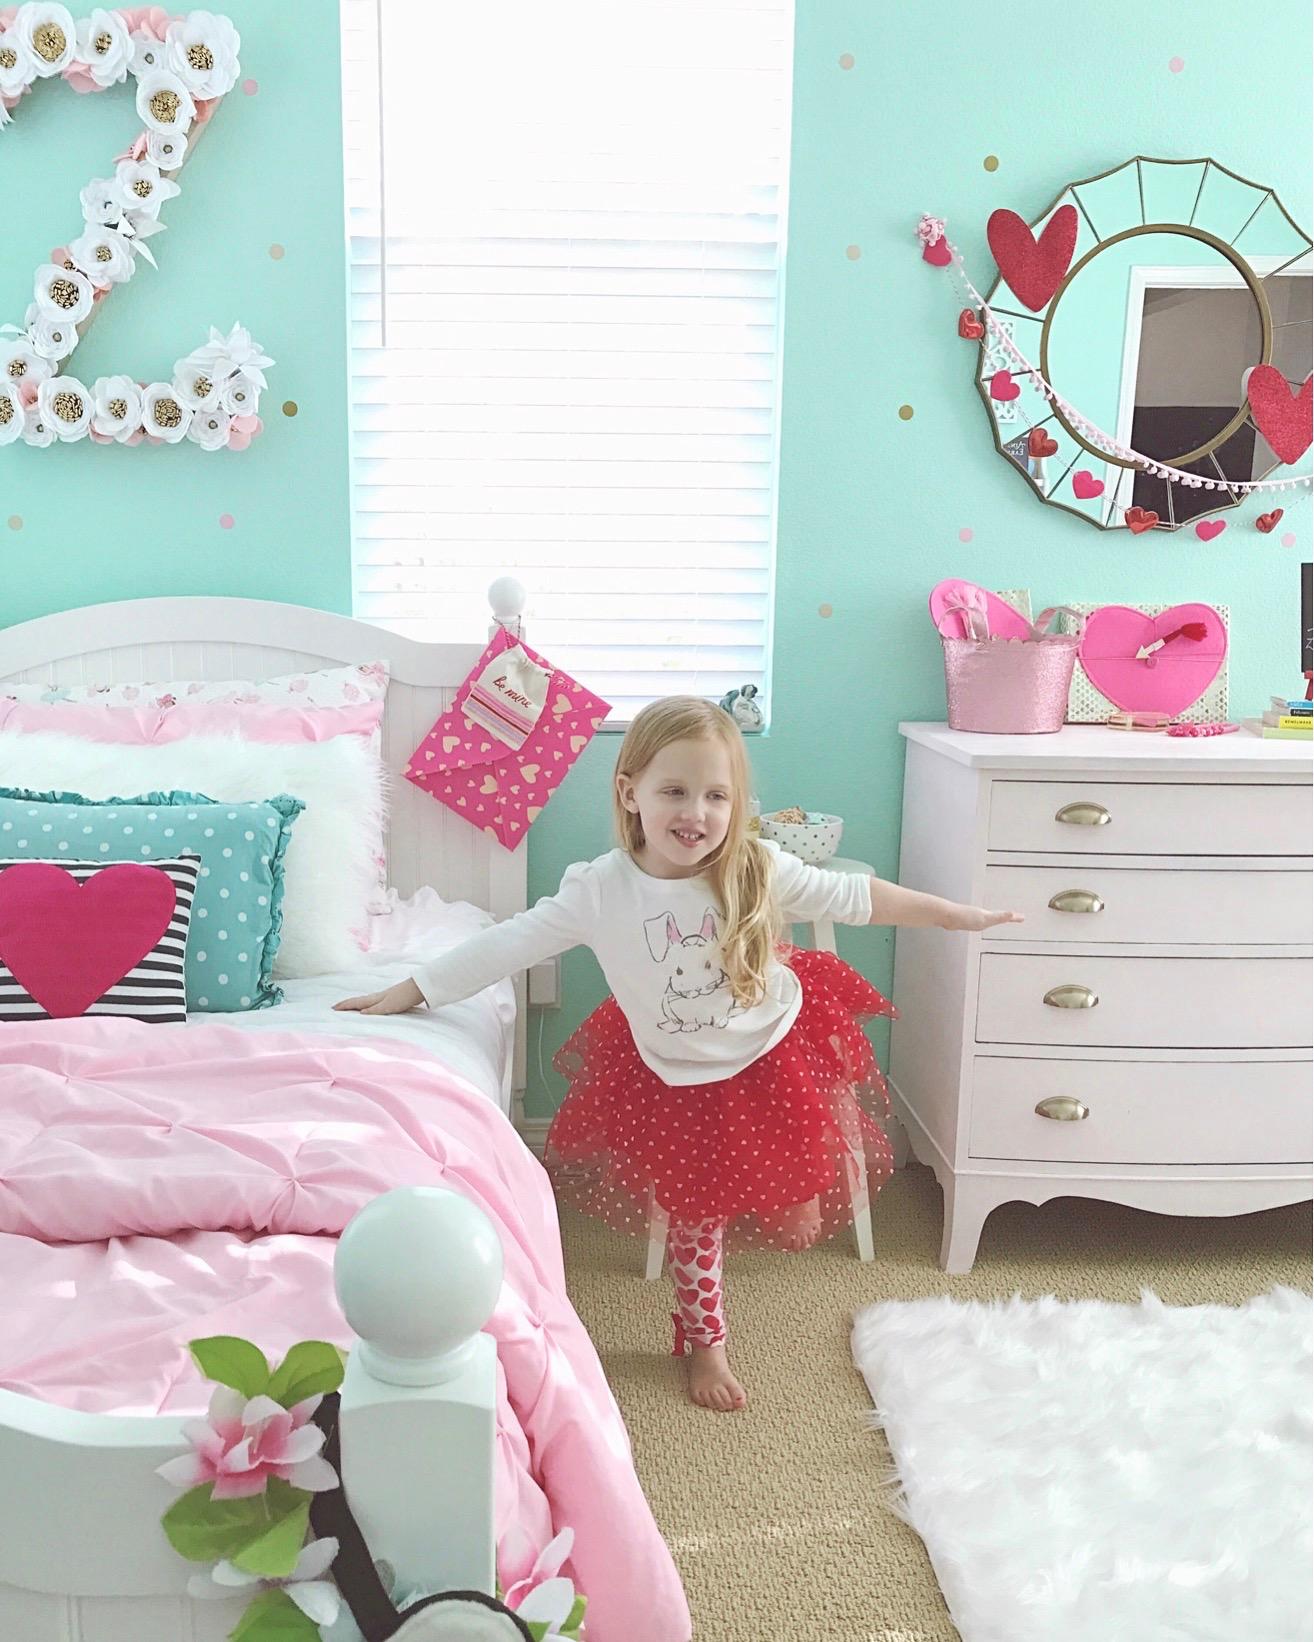 valentines-decor-girls-shared-bedroom-1111lightlane